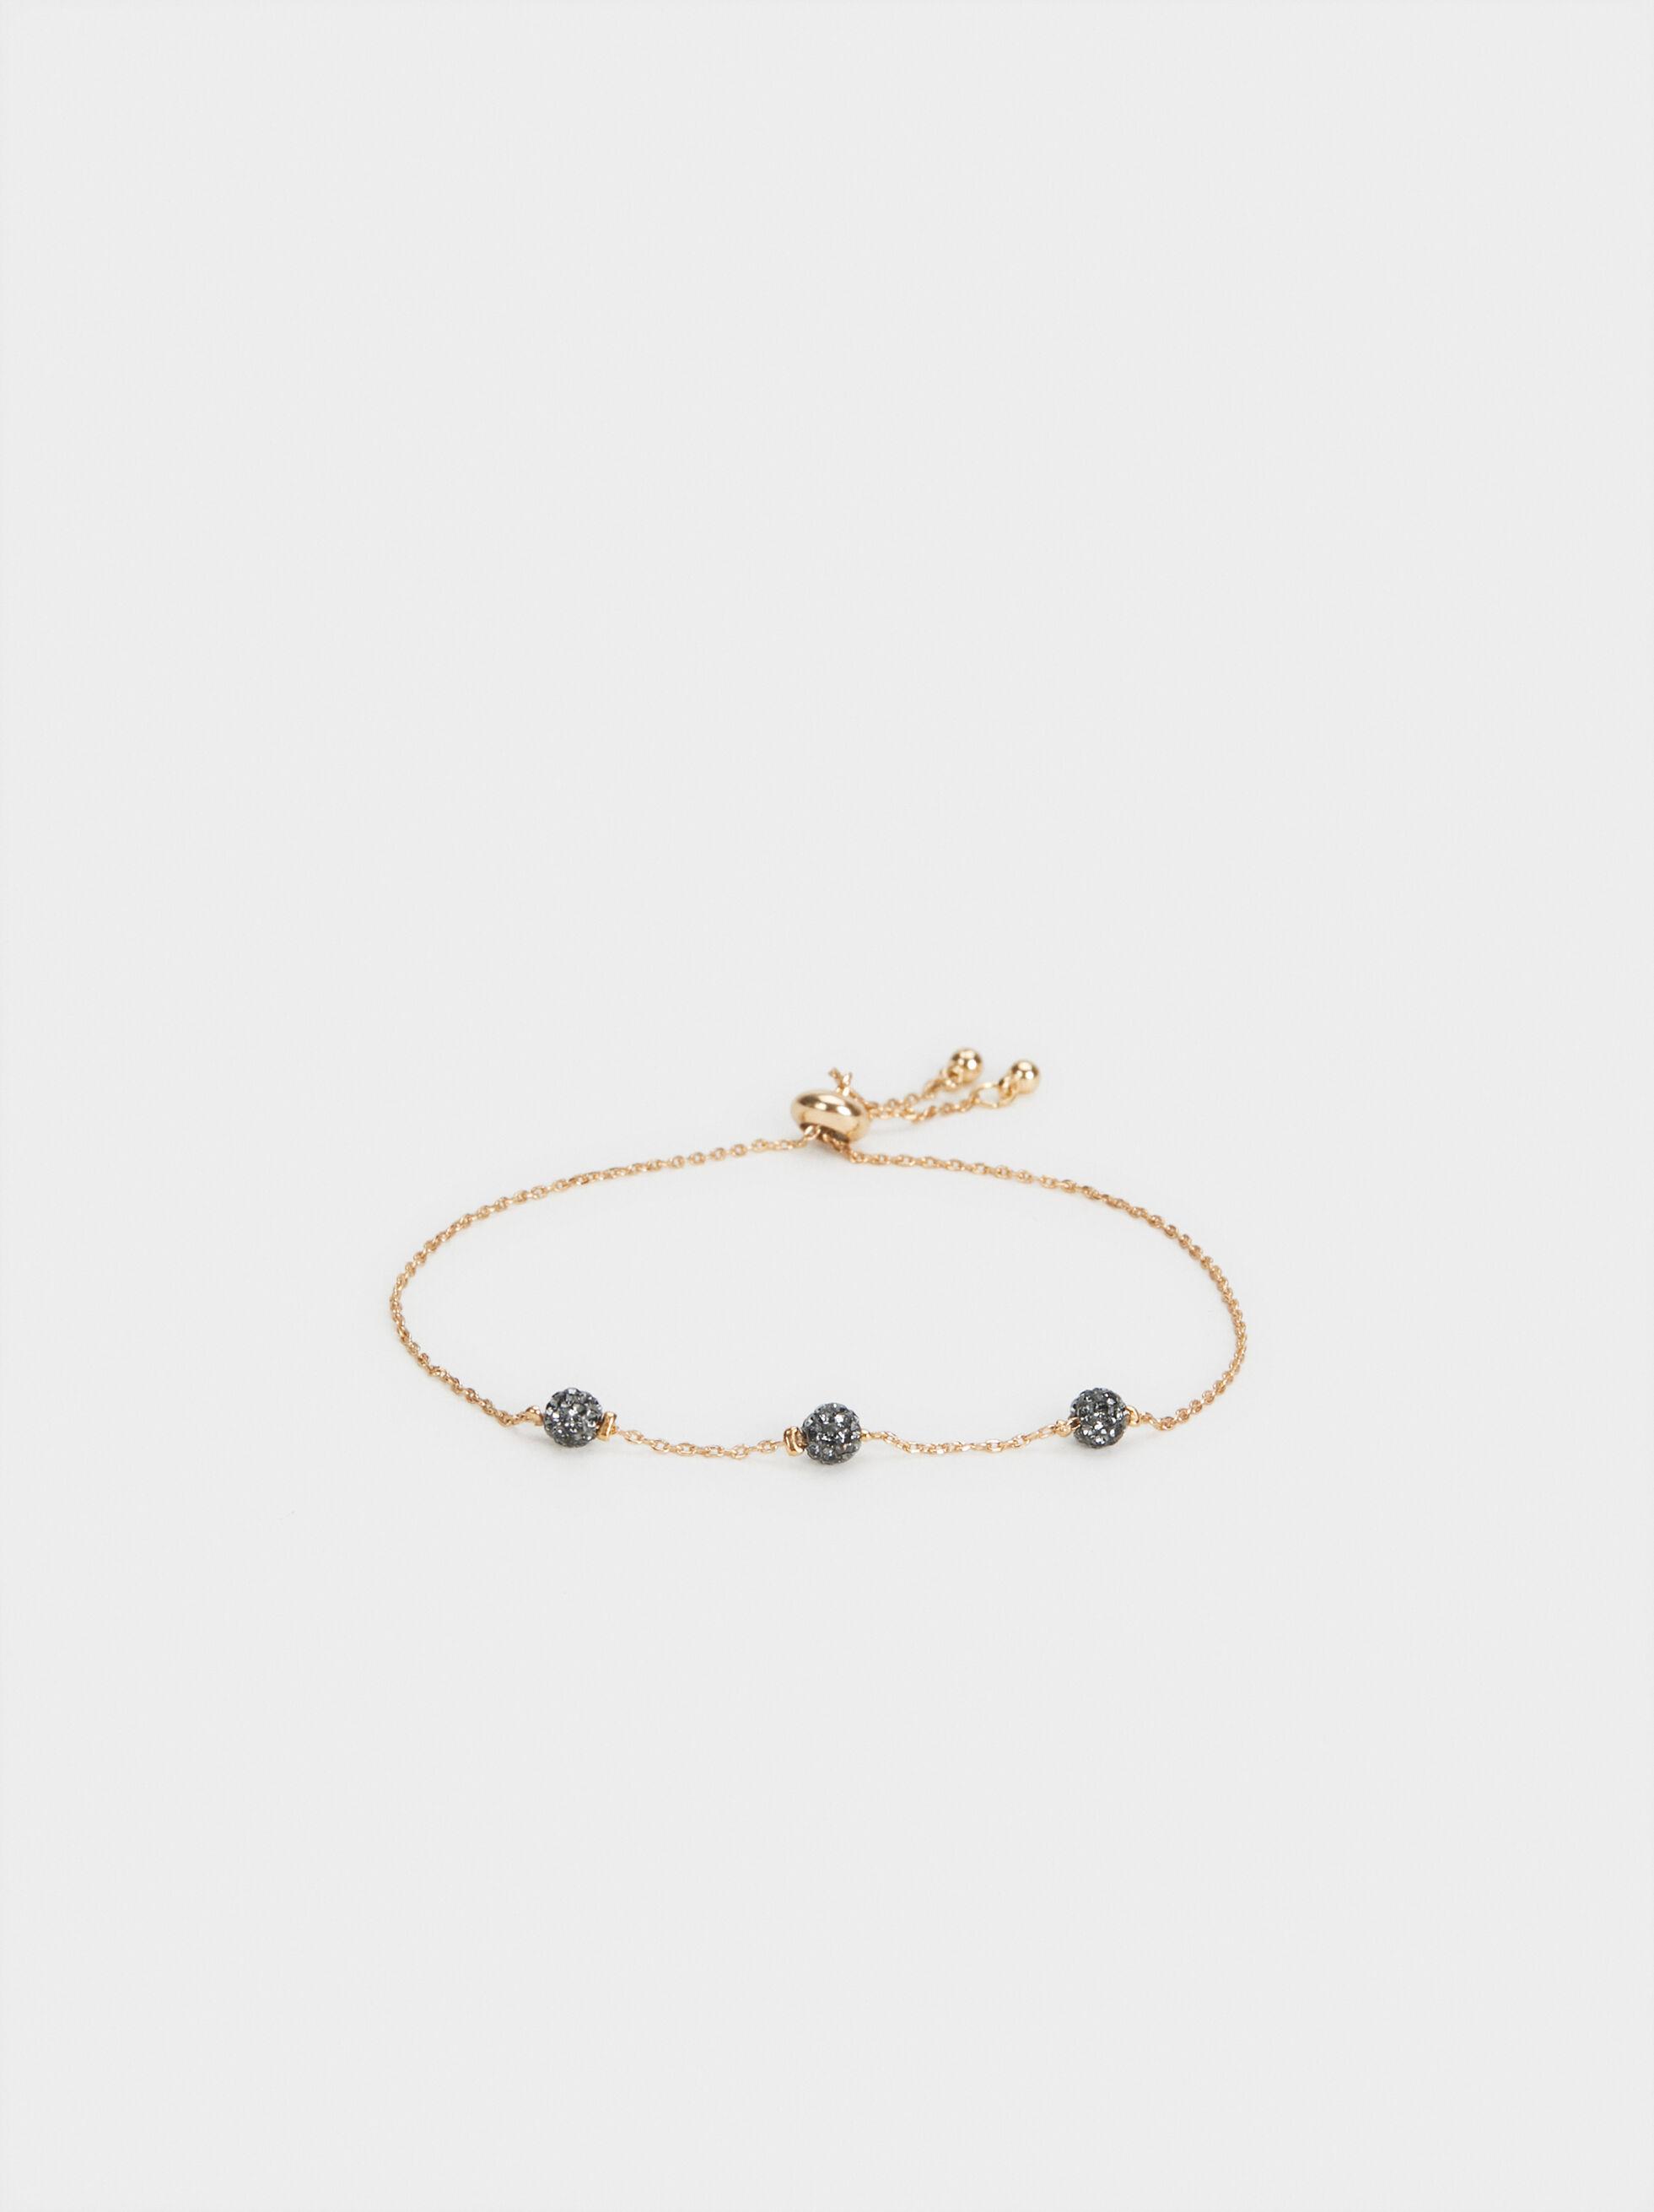 Adjustable Bracelet With Faux Diamond Clusters, , hi-res